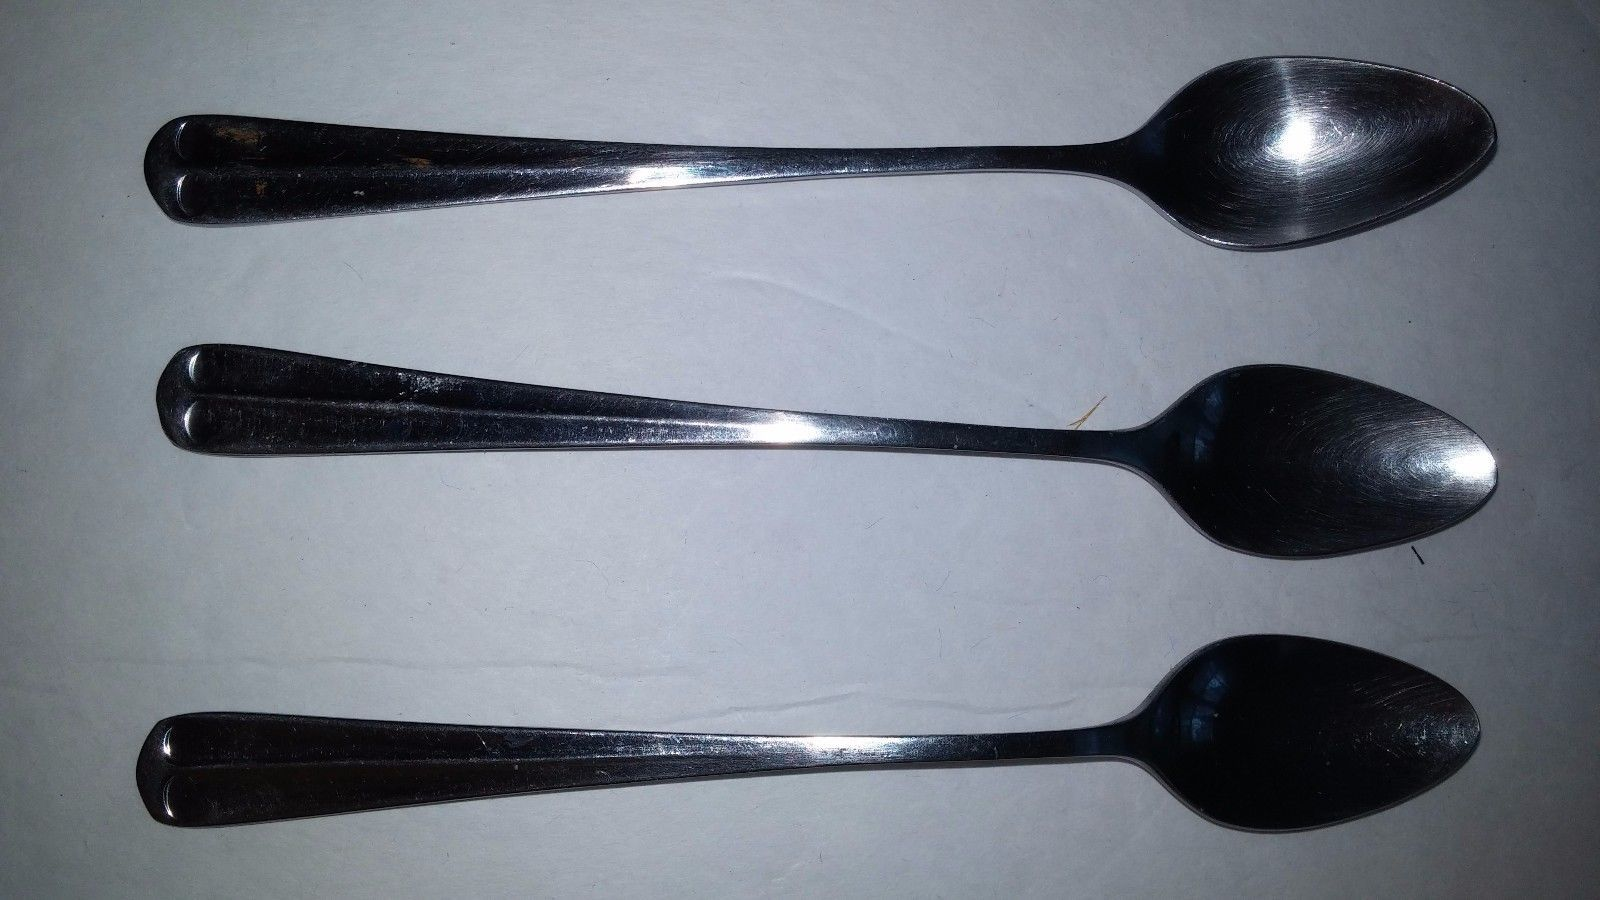 3 International Stainless Steel Flatware Gran Royal Long Ice Iced Tea Spoons - $11.61